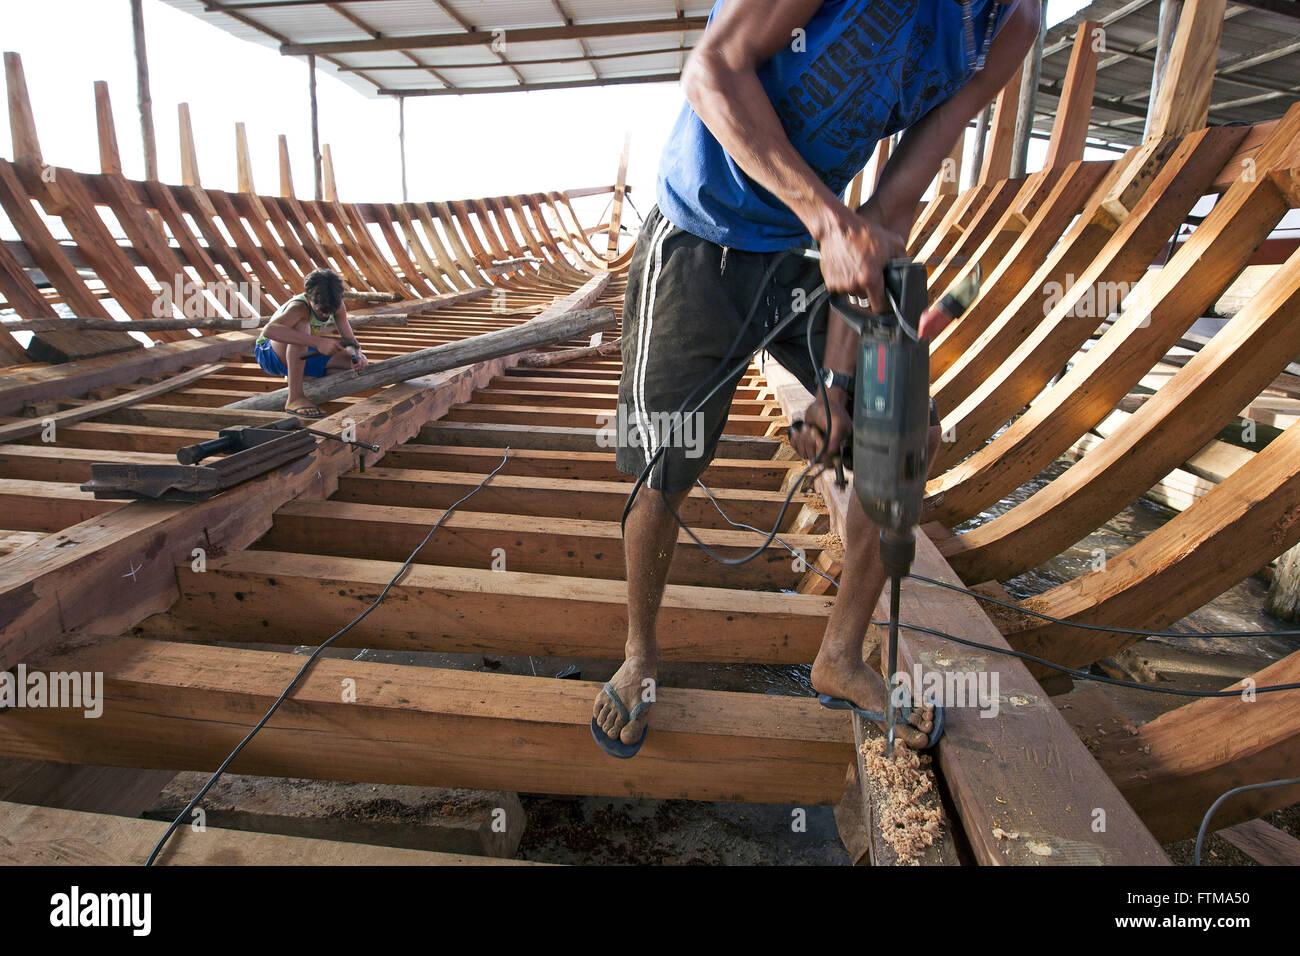 Handmade yard schooners in caicara village of South Cajaiba - Stock Image